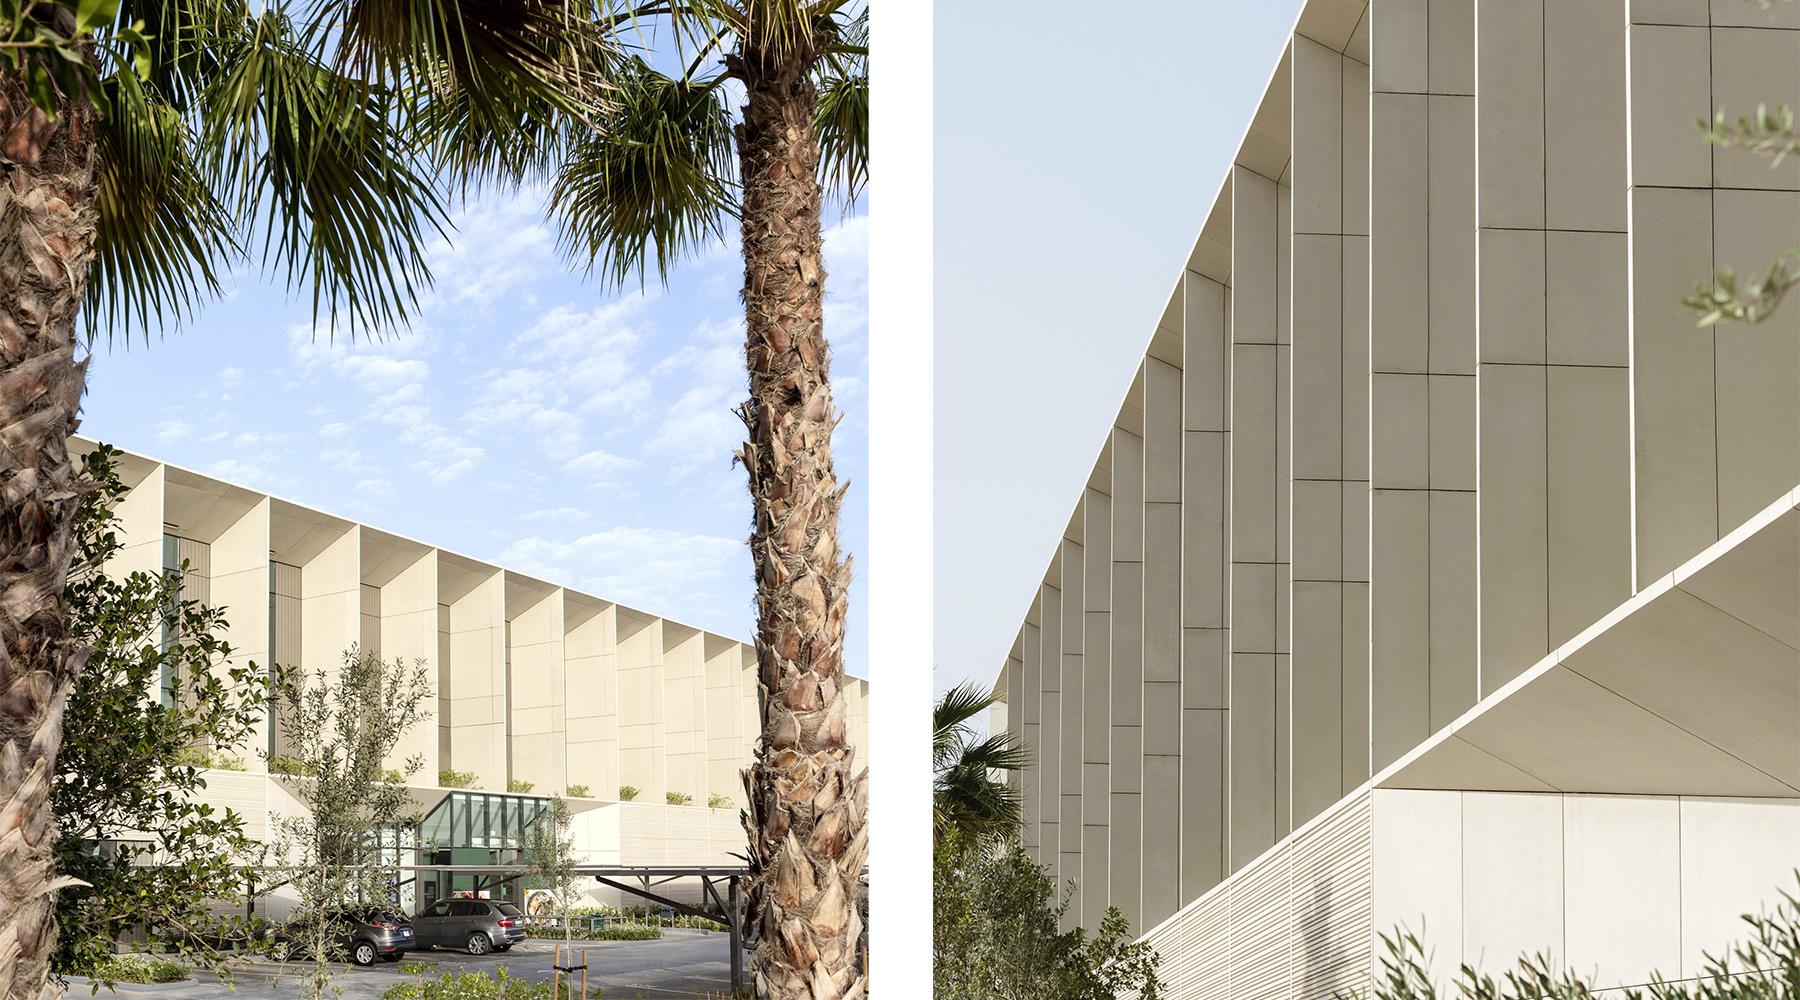 Meydan HQ Community Center